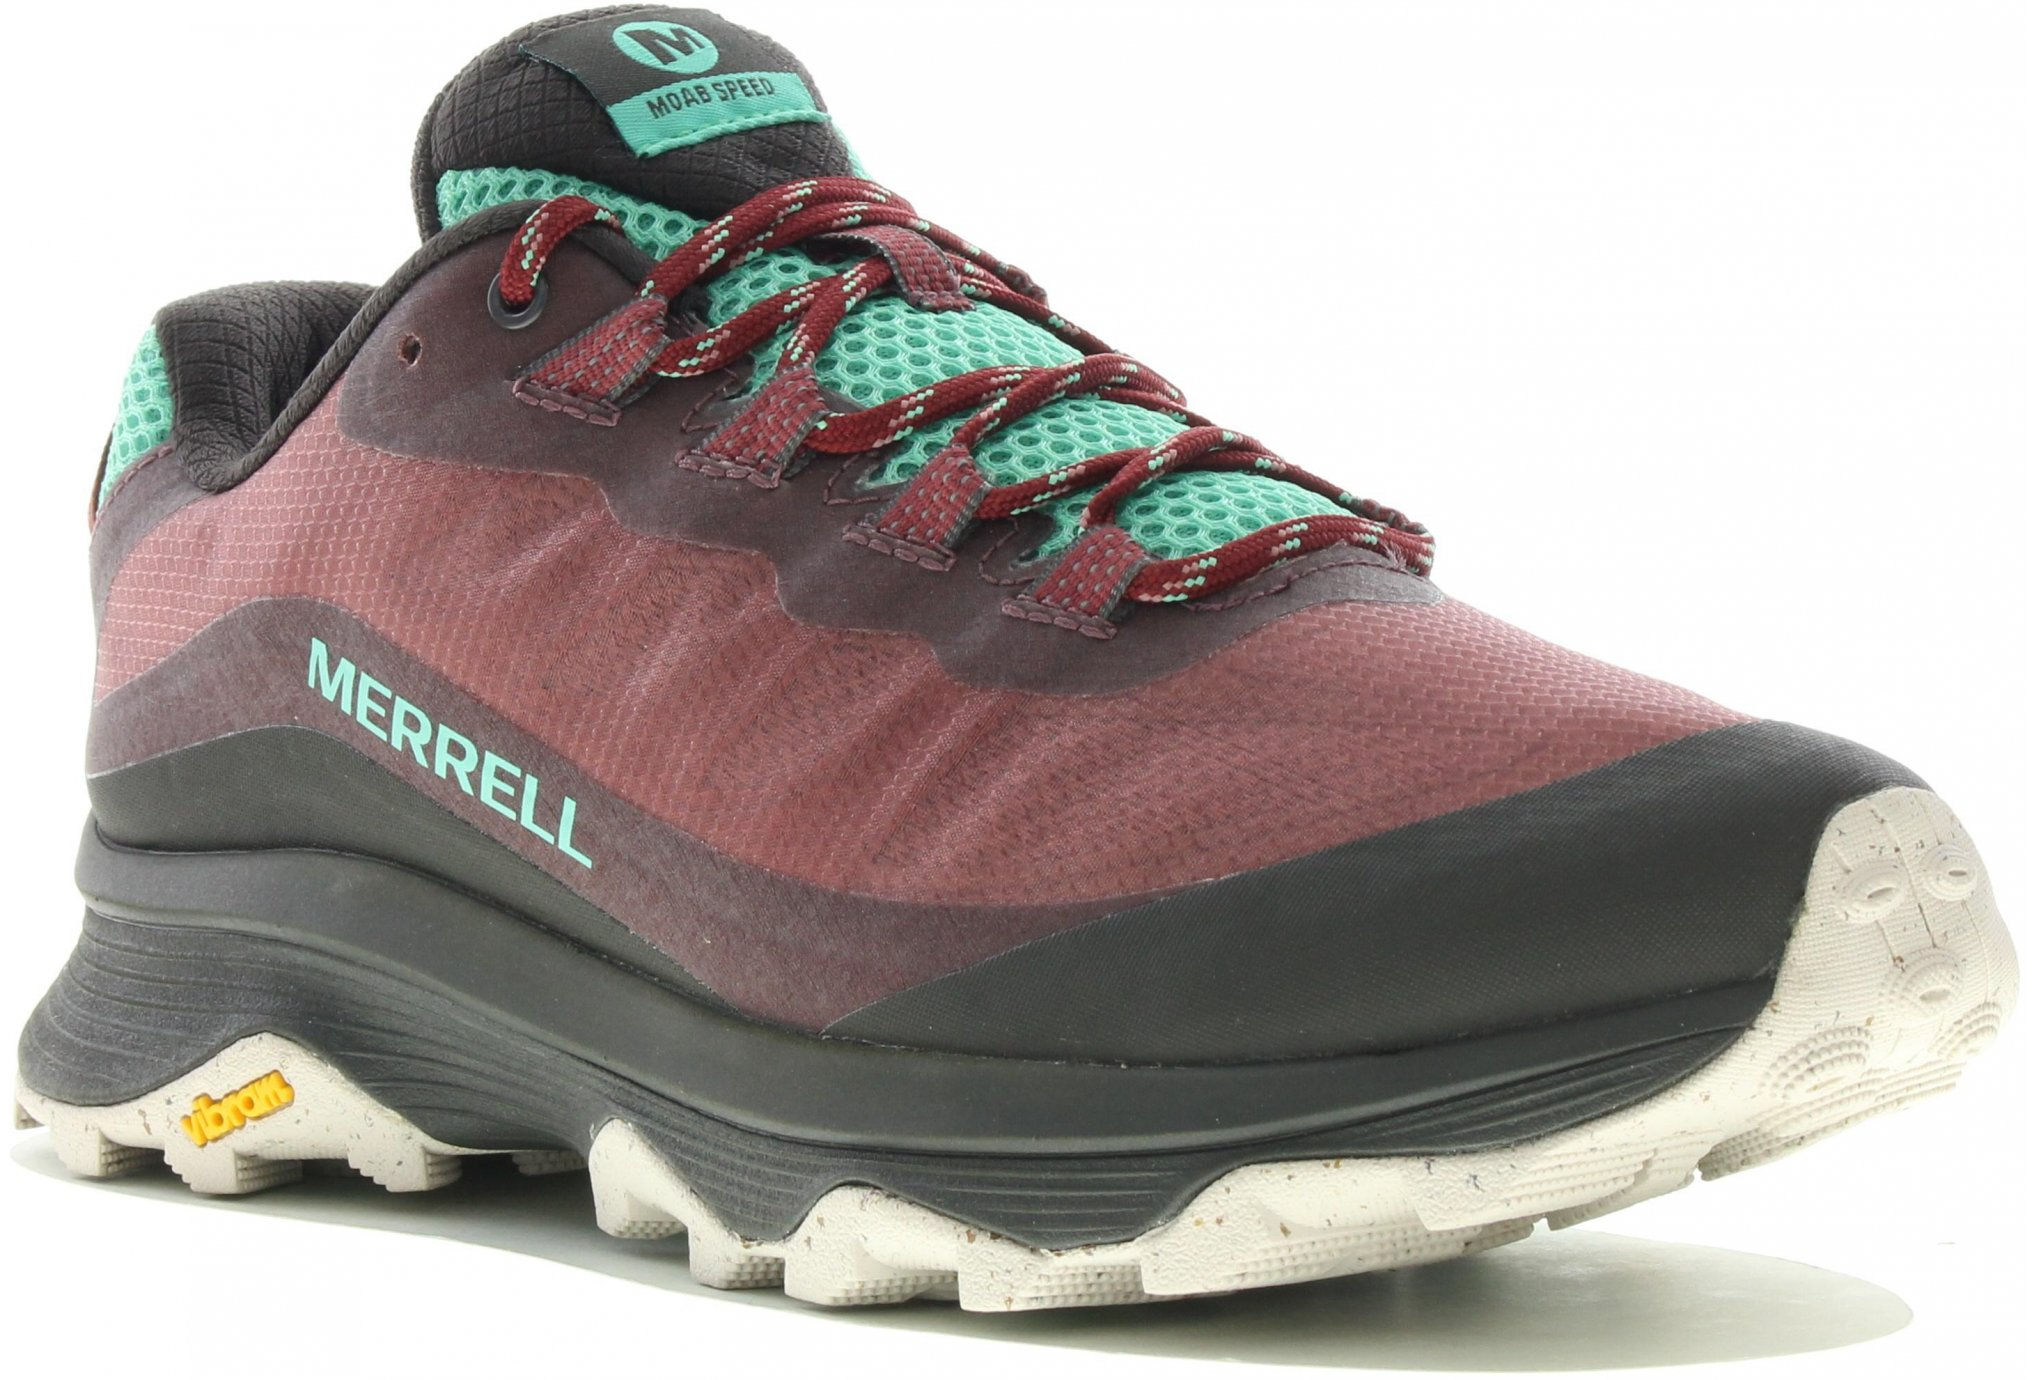 Merrell MOAB Speed W Chaussures running femme